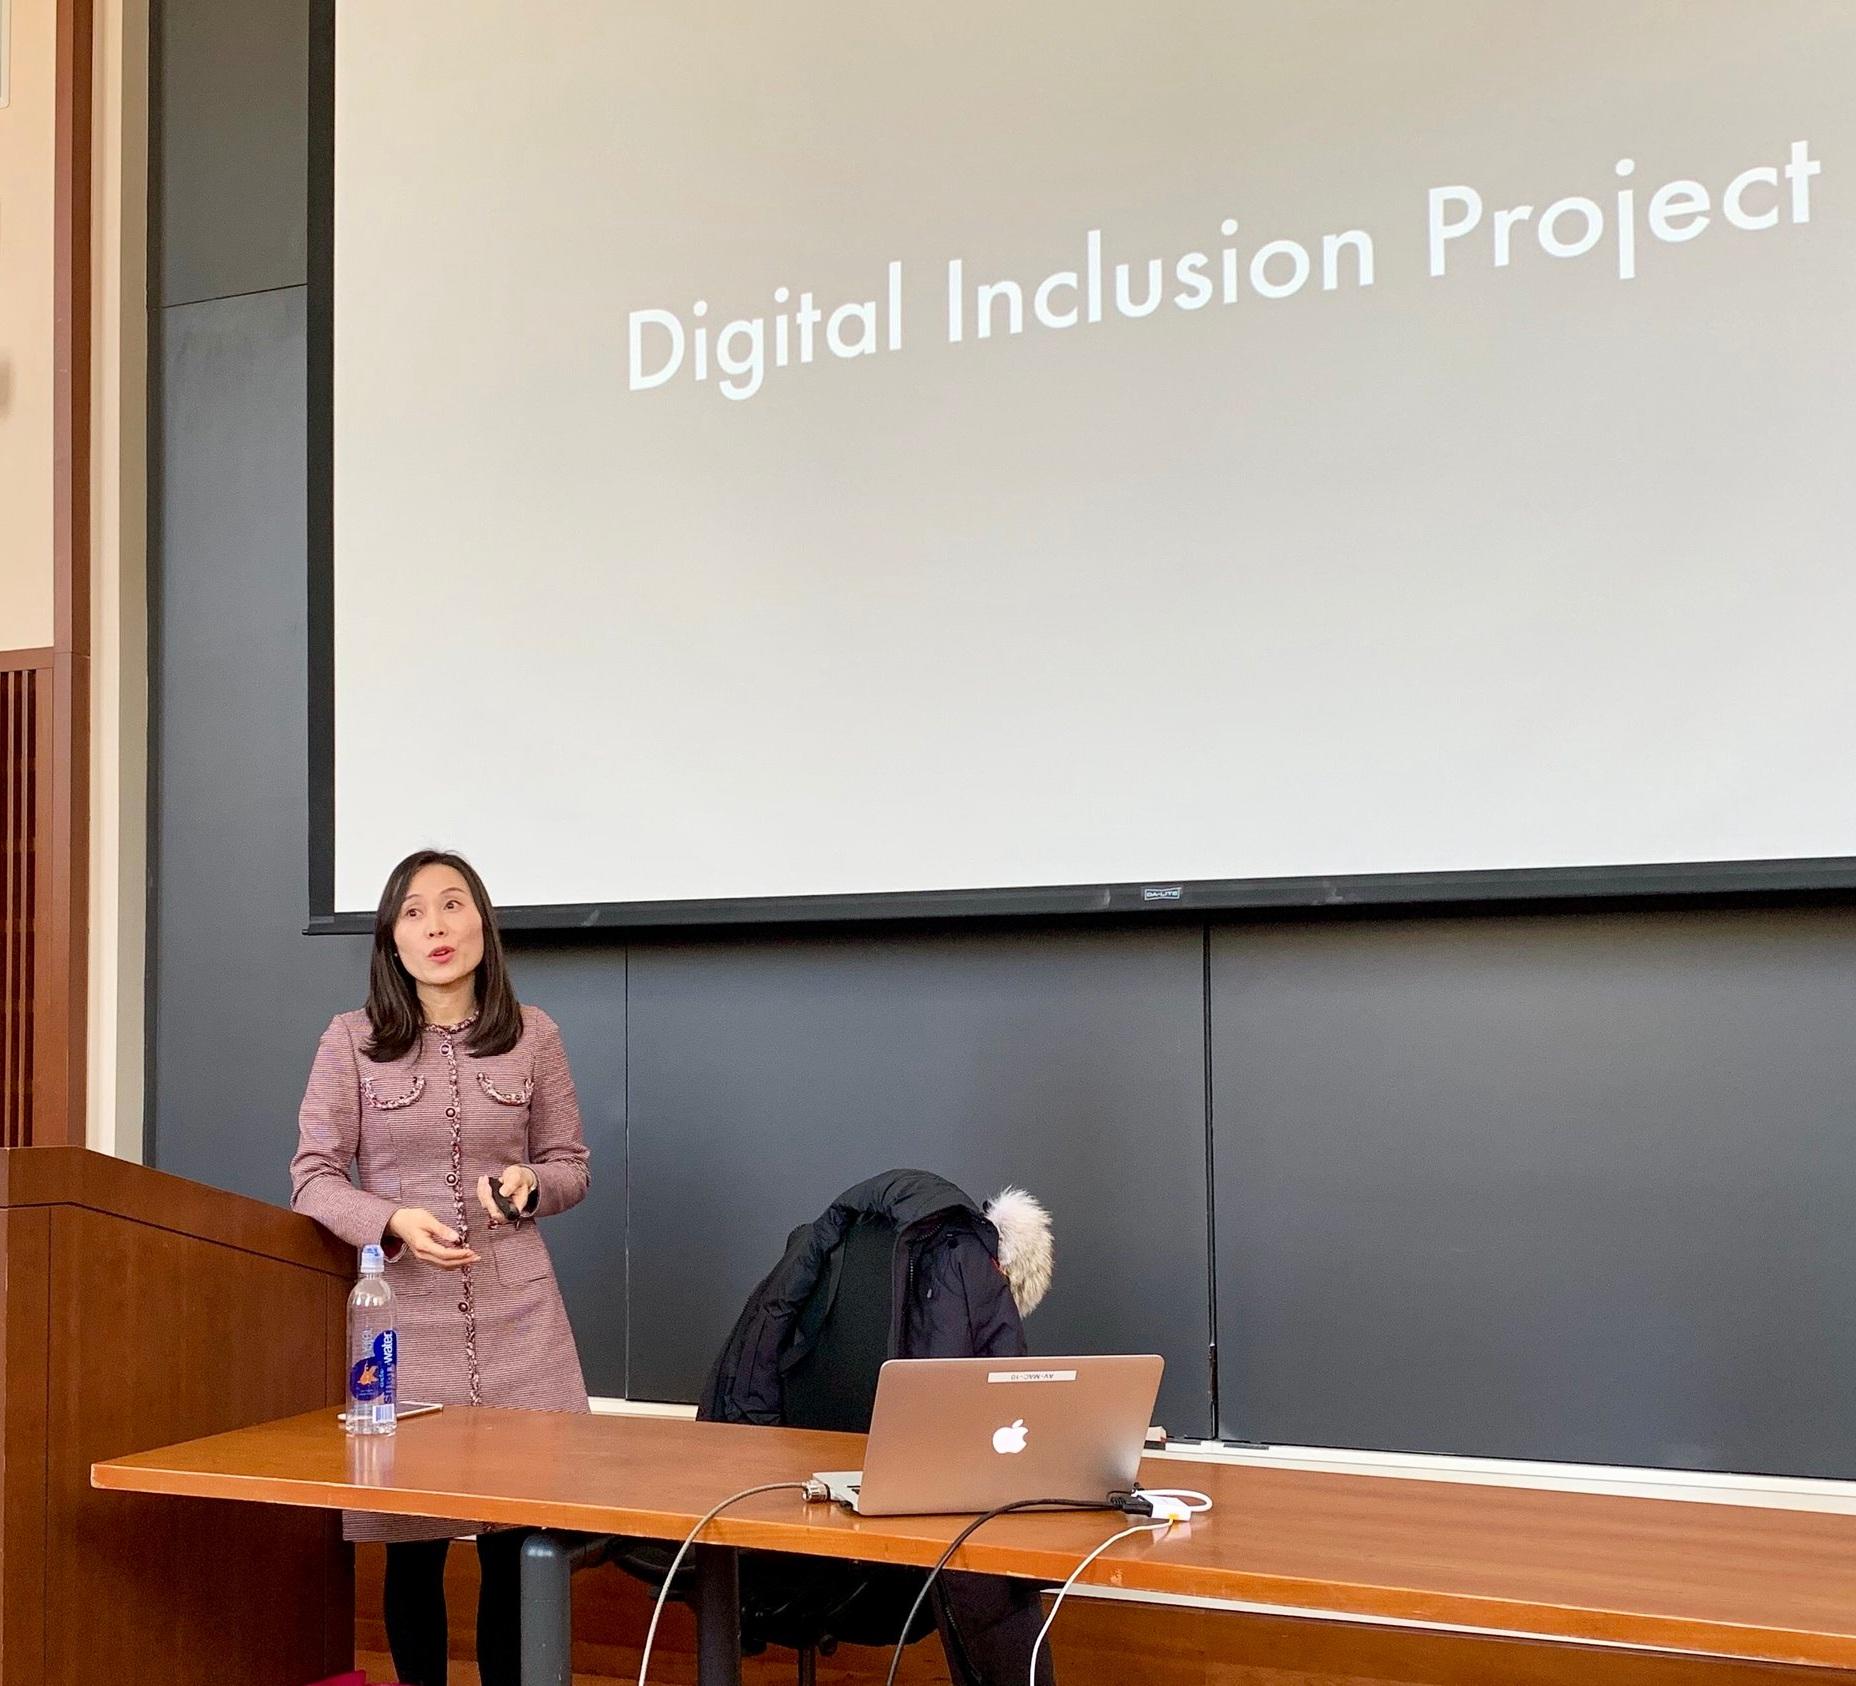 Associate Professor Hyunjin Seo gave a presentation at Harvard Law School on March 5.